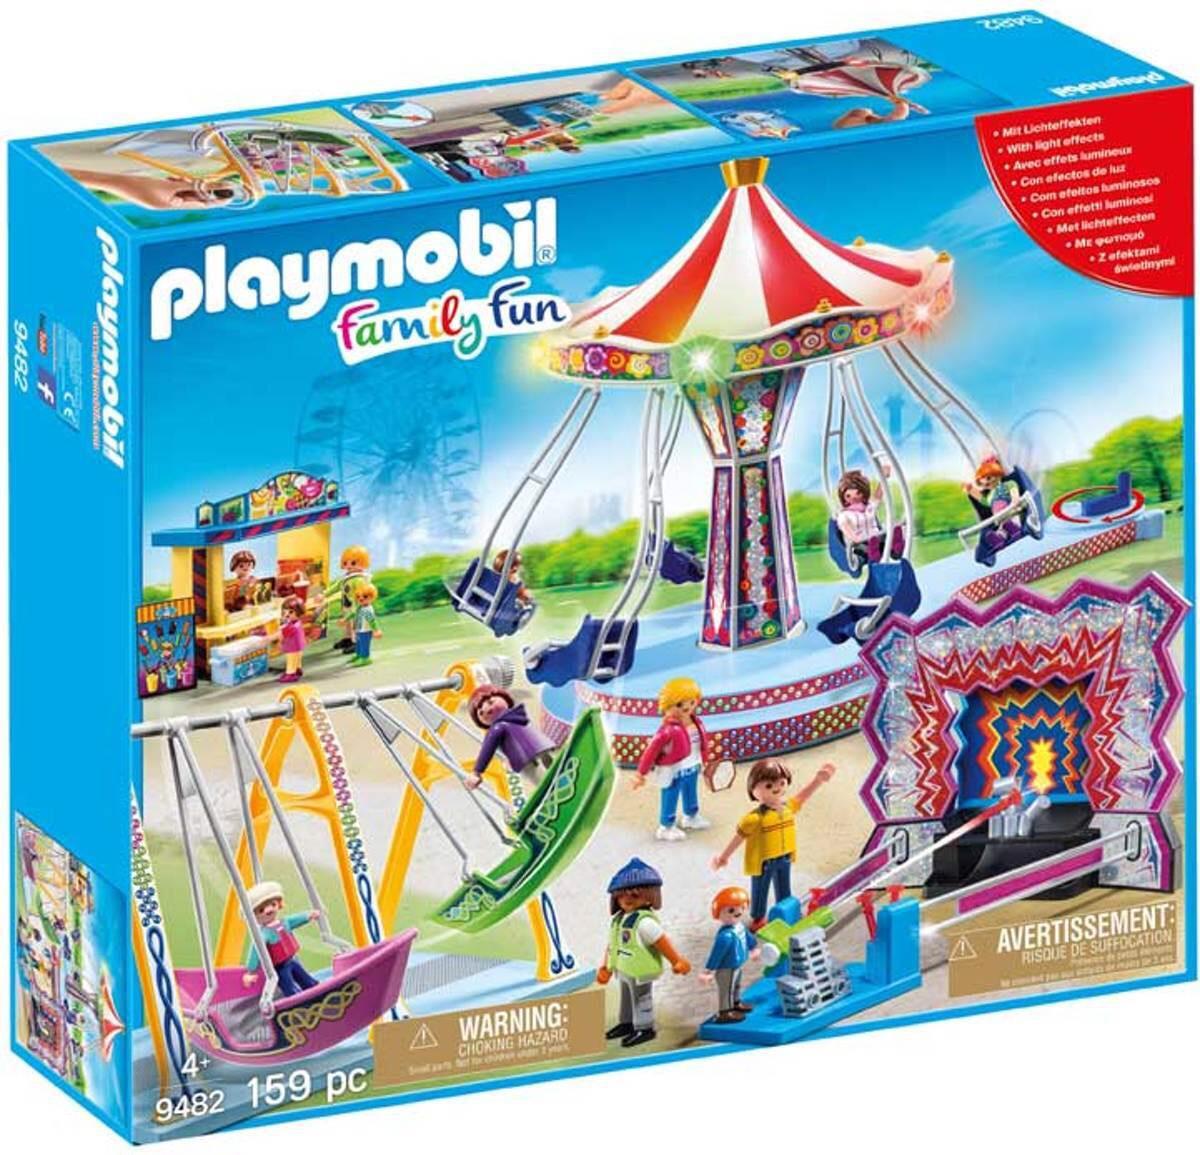 Playmobil - Family Fun kermis 9482